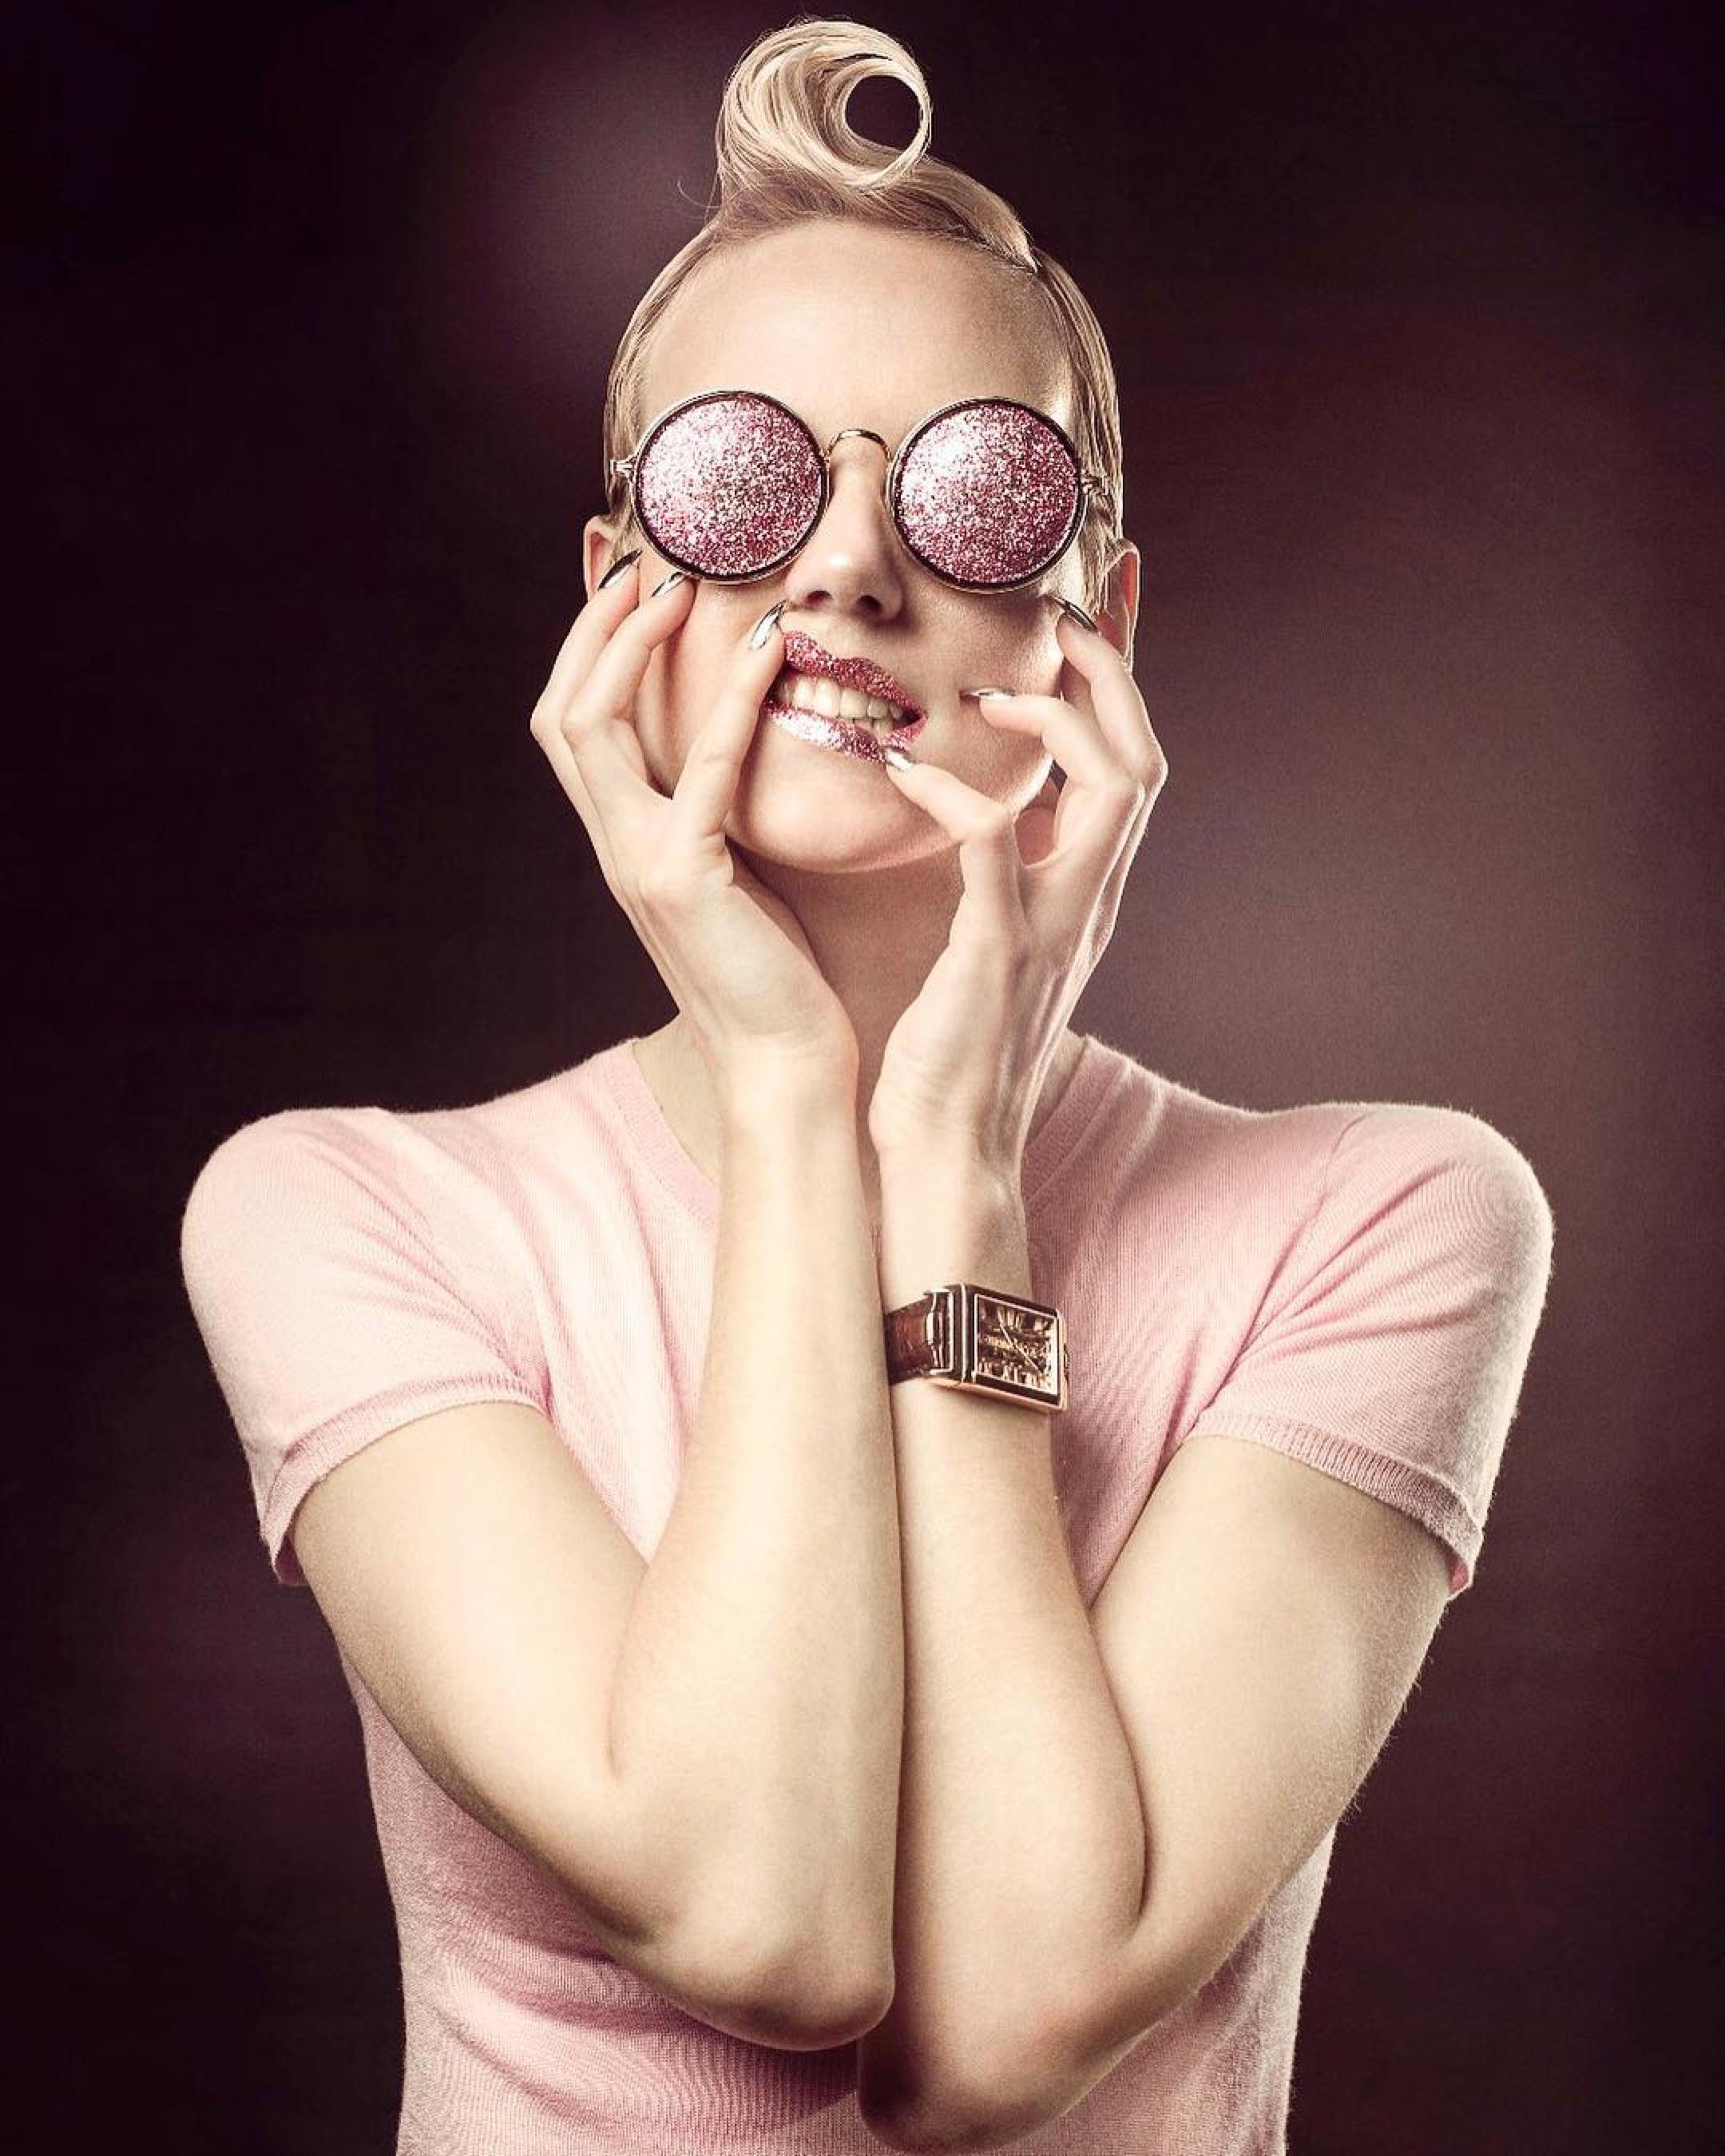 Juliette_jourdain_photographe_advertising_portrait_valerie_paumelle_agent_corum (2).JPG